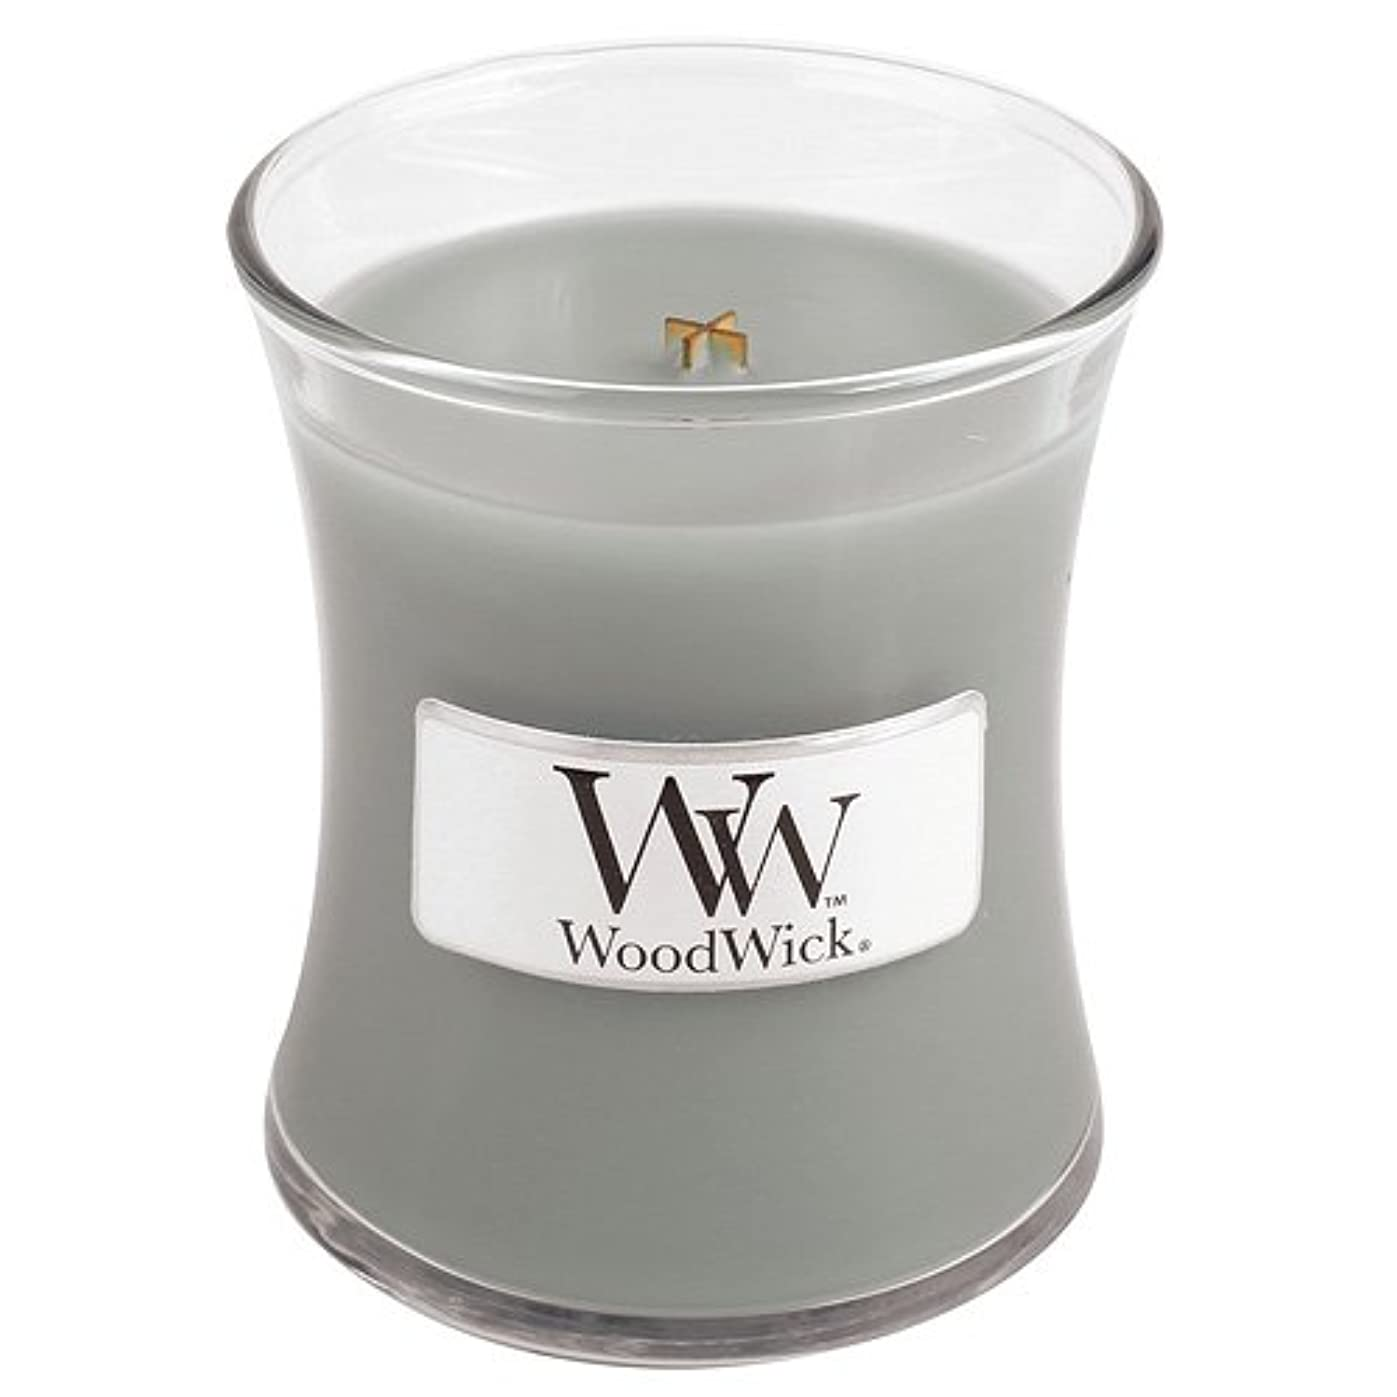 Woodwick Mini Fireside Candle 3.4oz by WoodWick